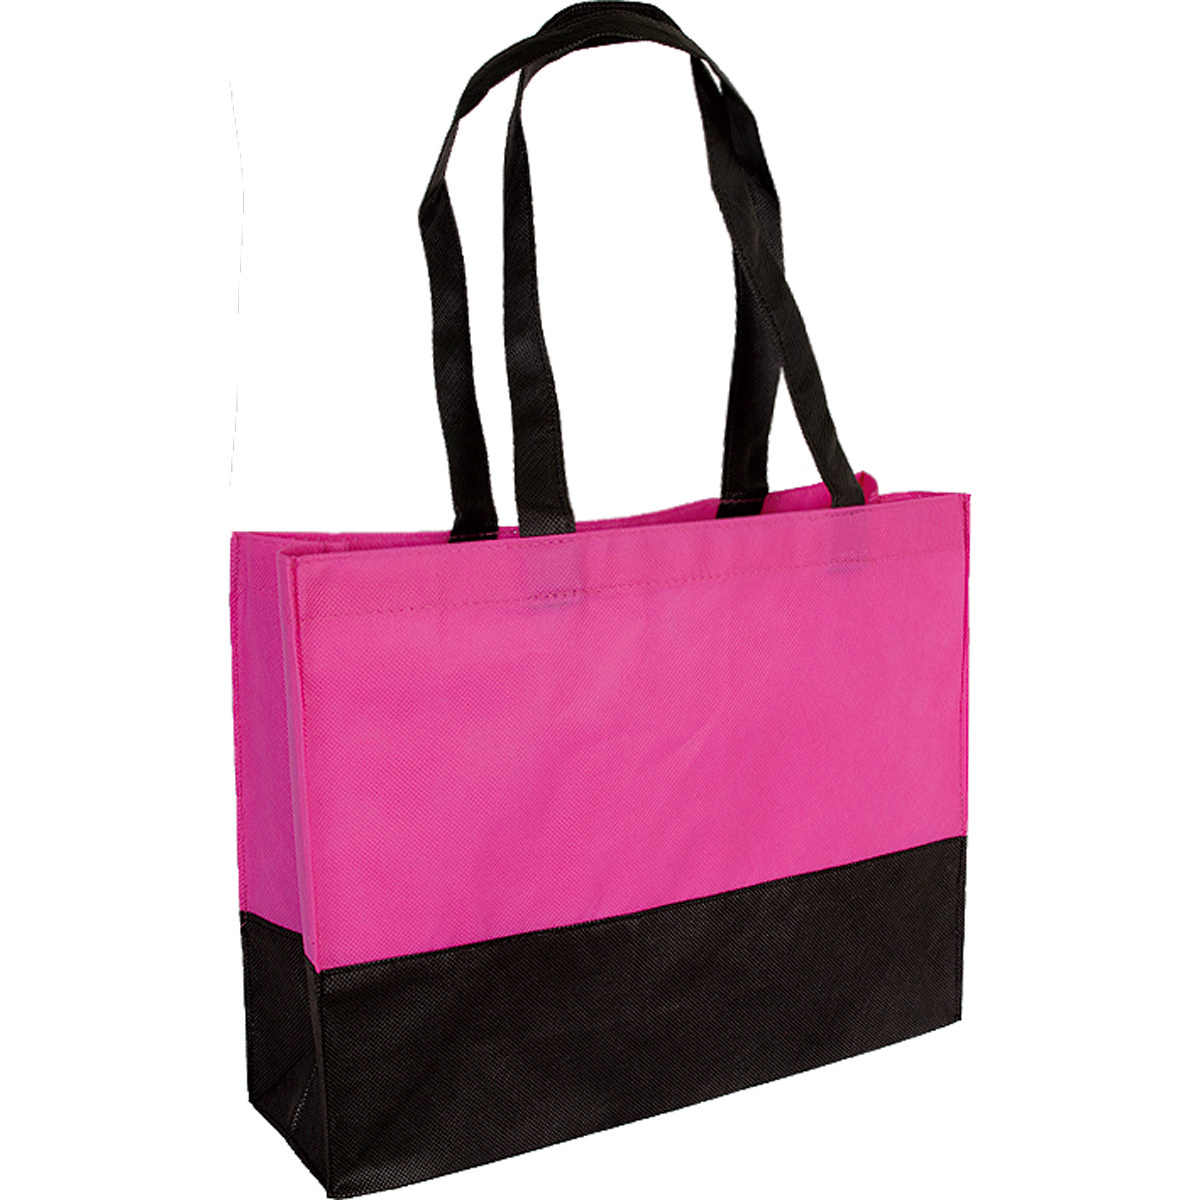 City-Bag 1